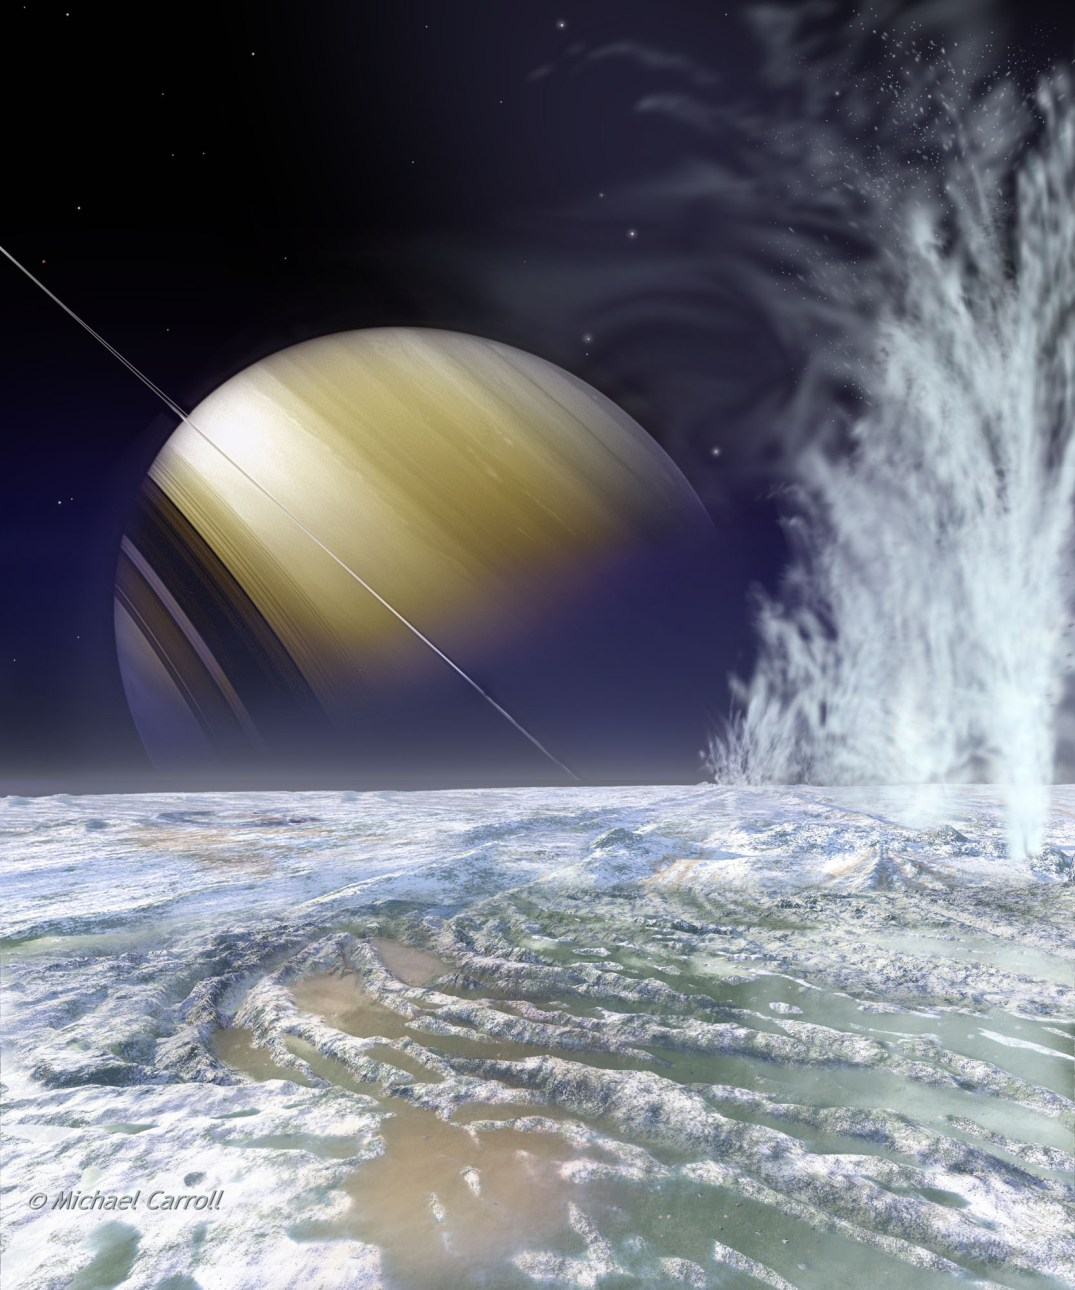 https://i2.wp.com/eternosaprendizes.com/wp-content/uploads/2008/10/enceladus-por-michael-carroll.jpg?resize=1075%2C1290